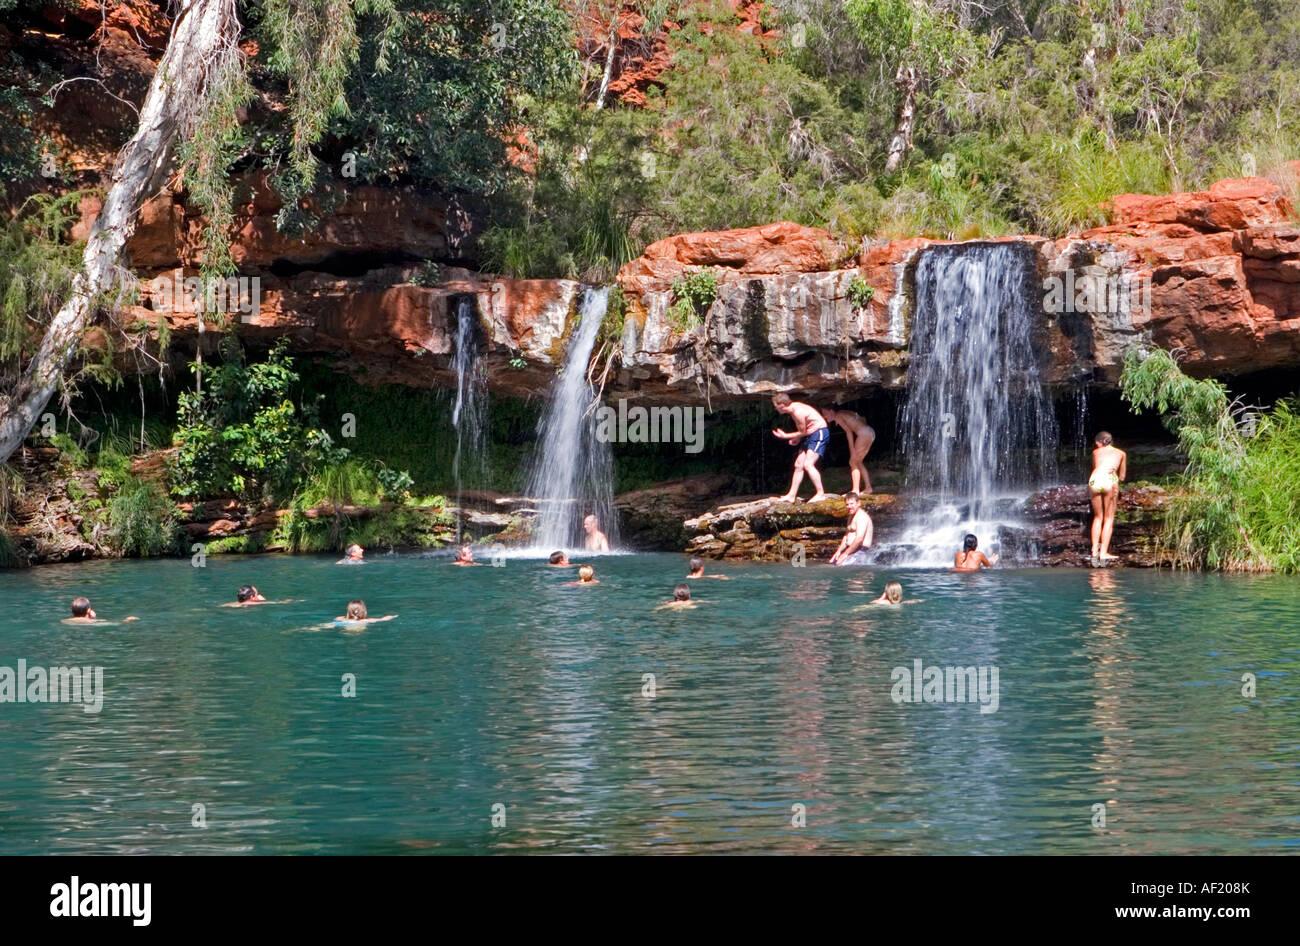 Fern Pool In Karijini National Park Western Australia Stock Photo Royalty Free Image 13804770